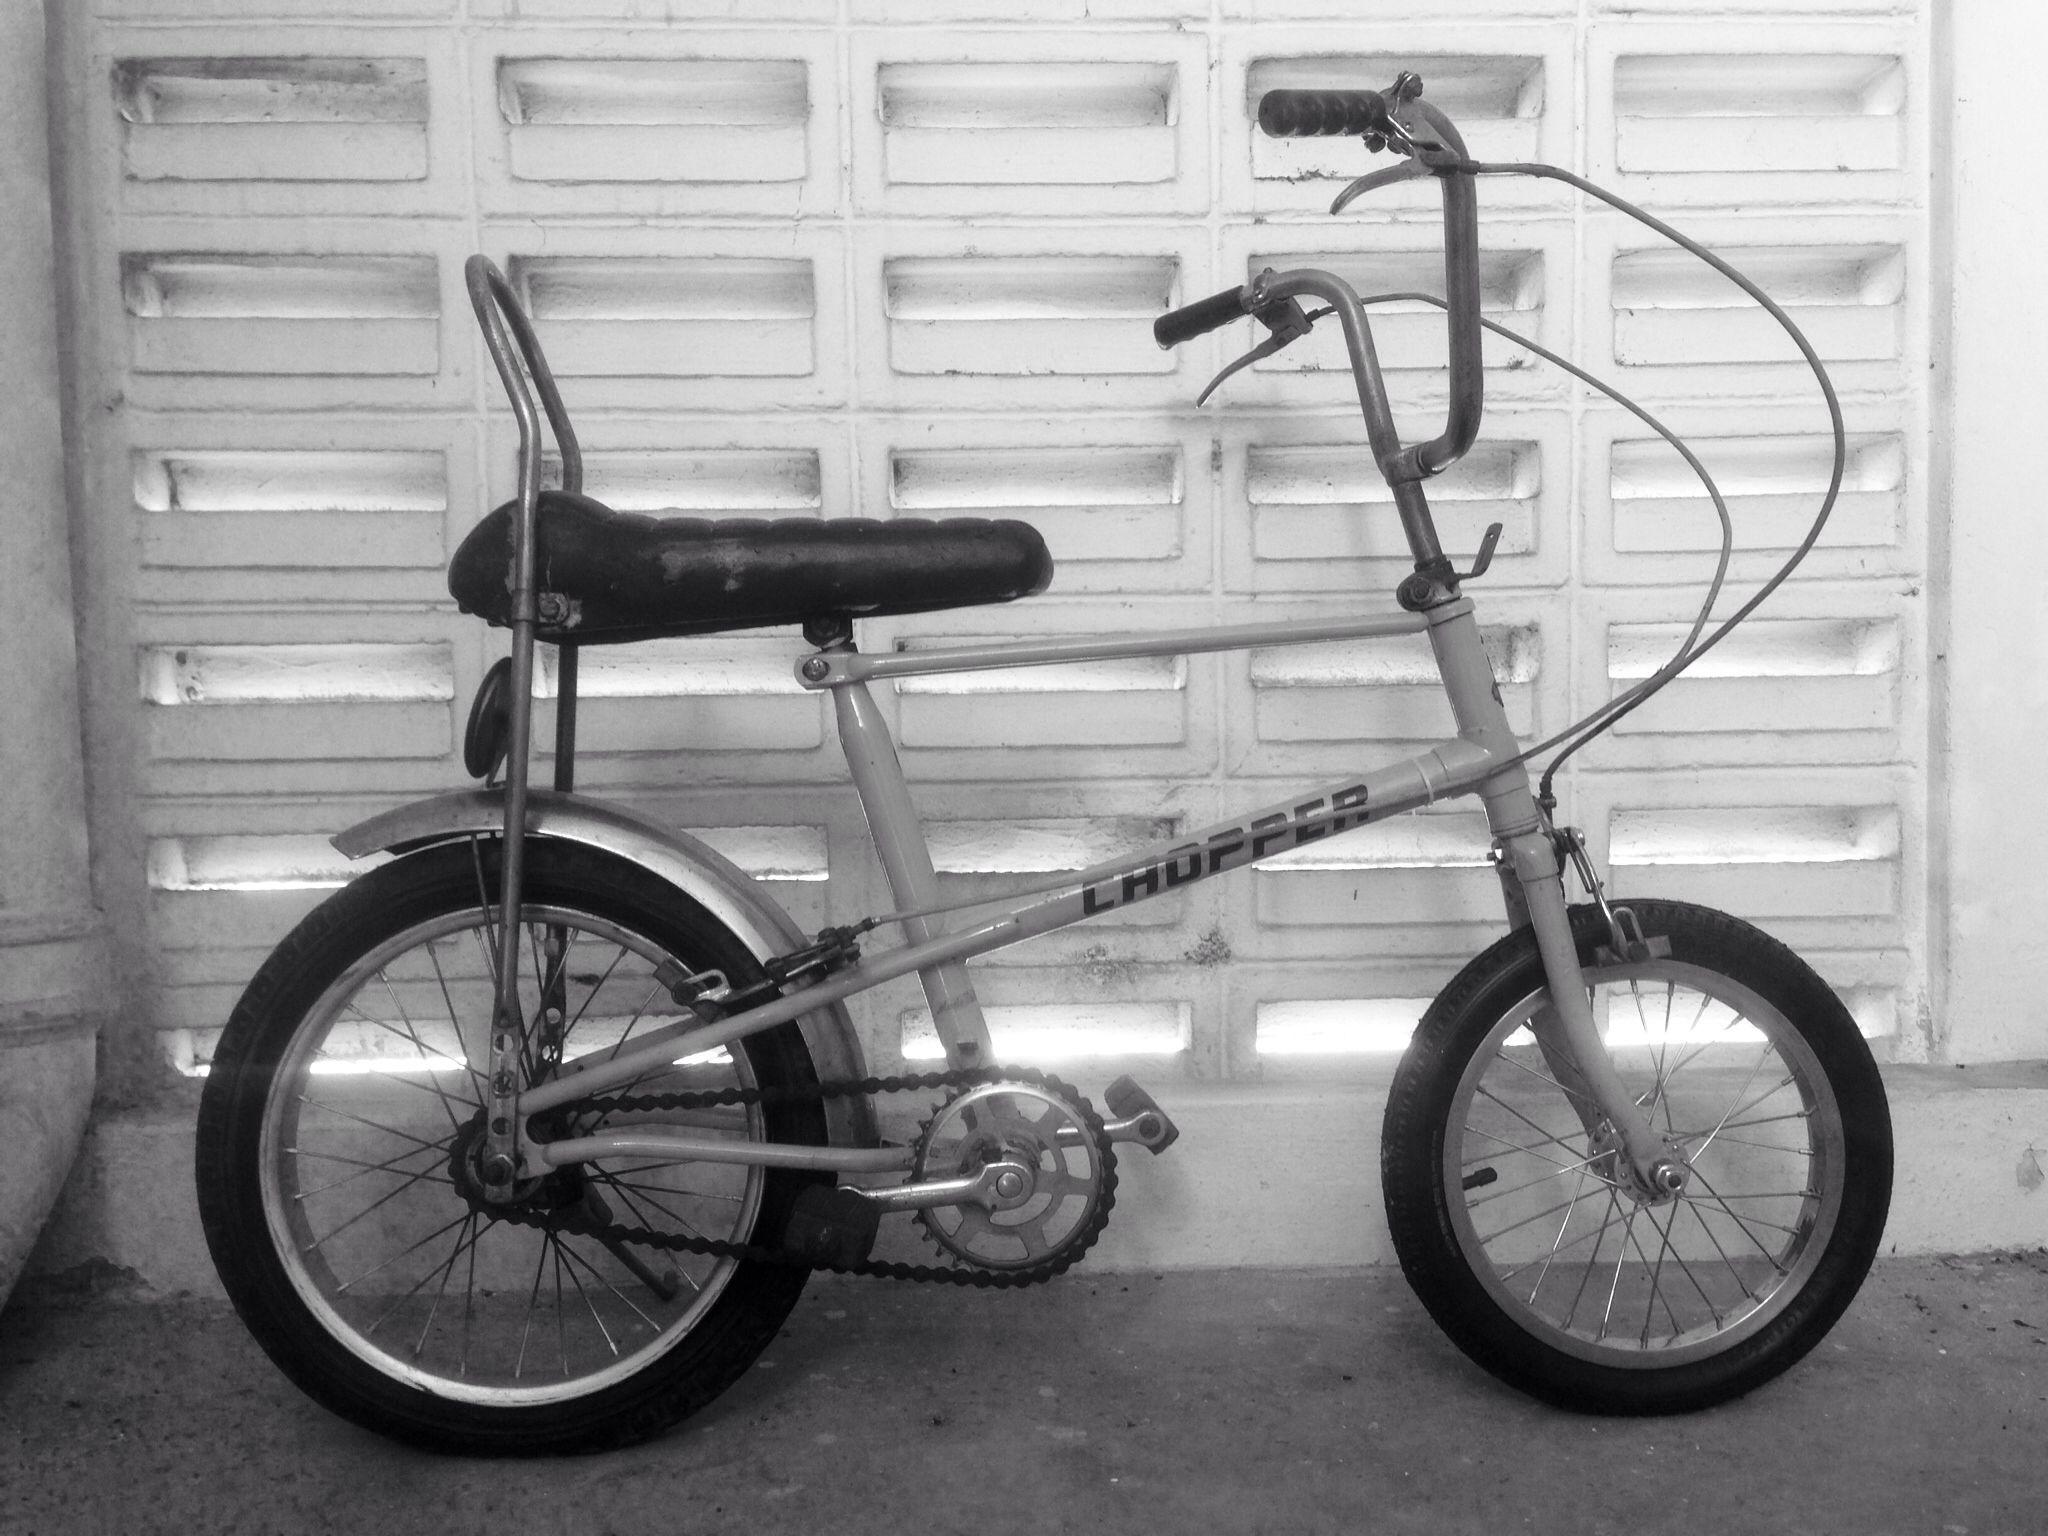 Vintage Classic Chopper Bike Saddle Seat Black NOS